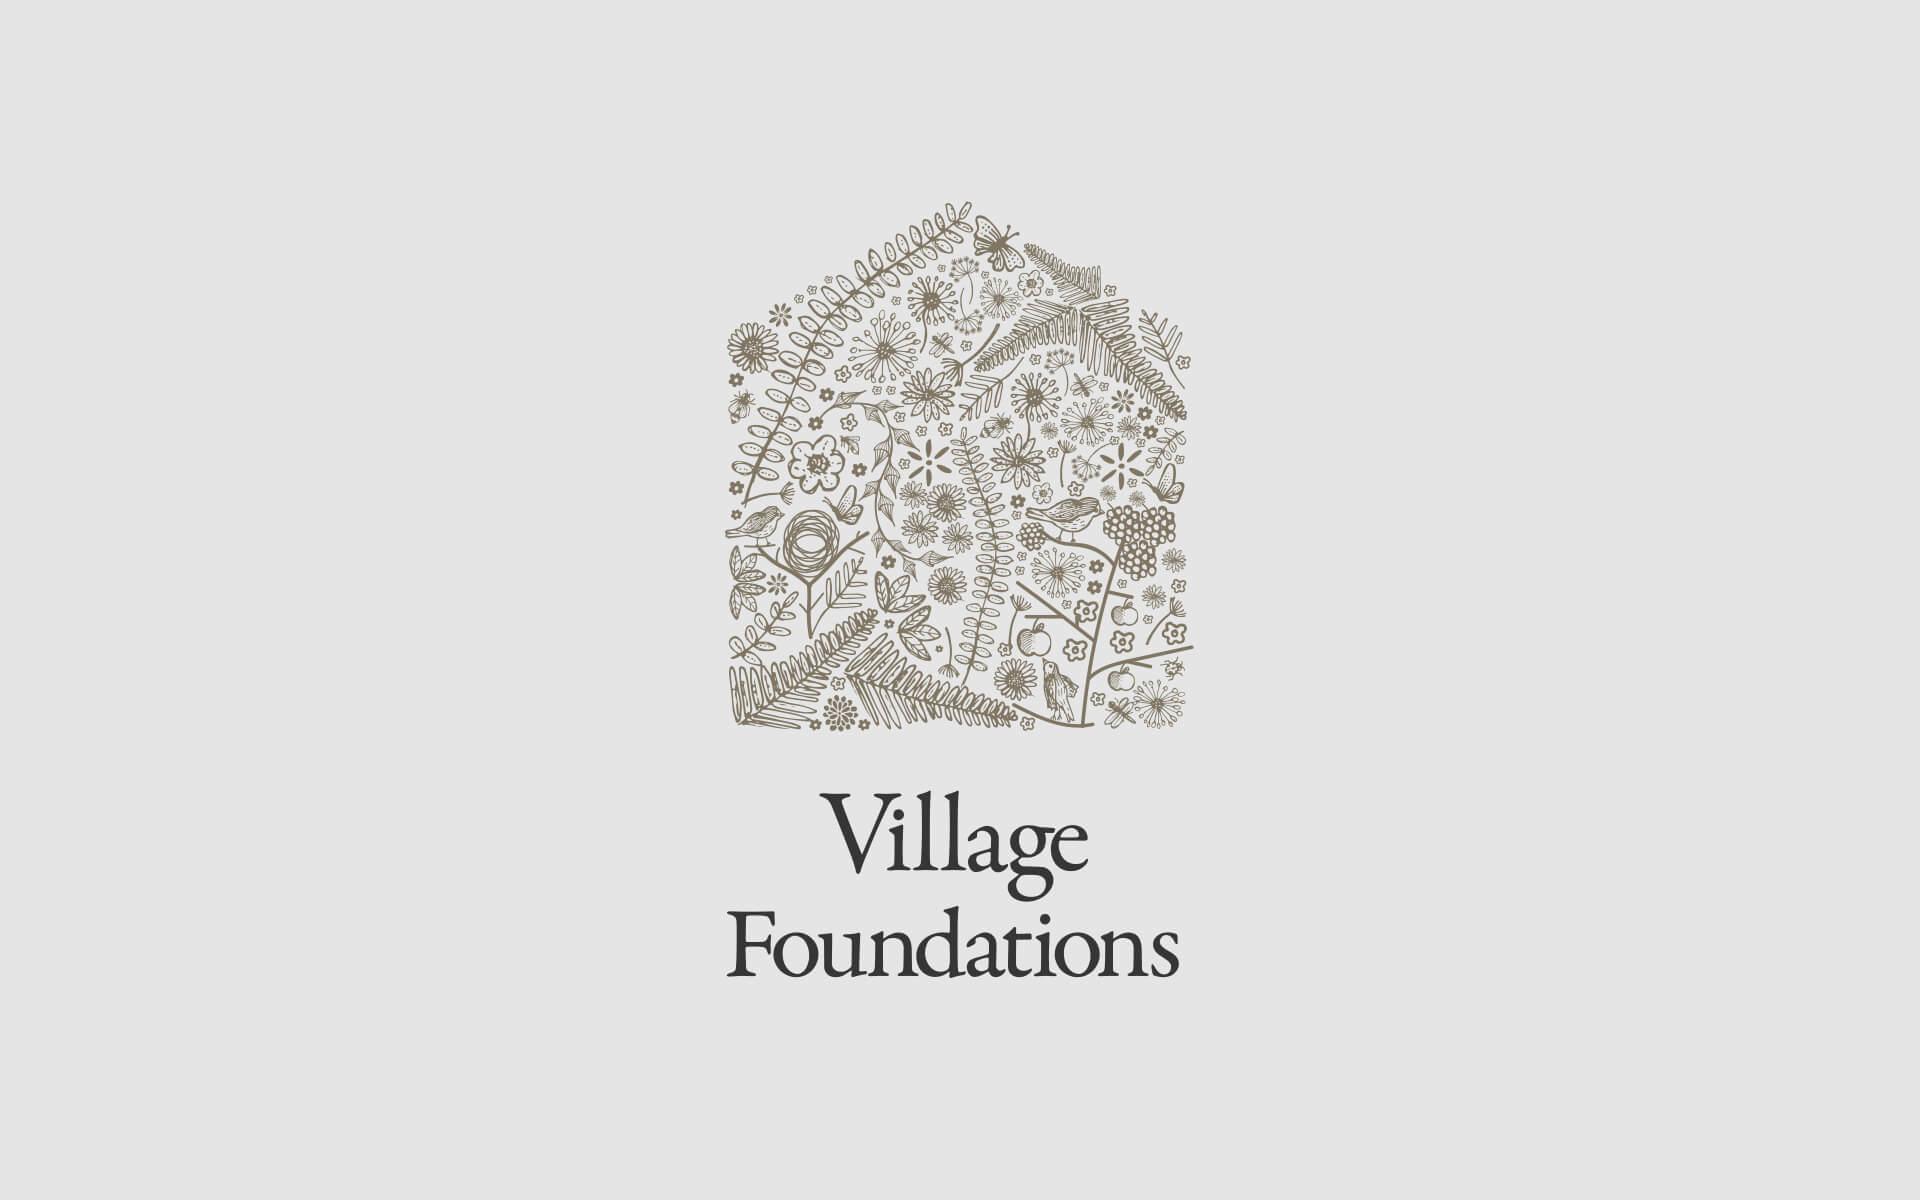 Village Foundations logo